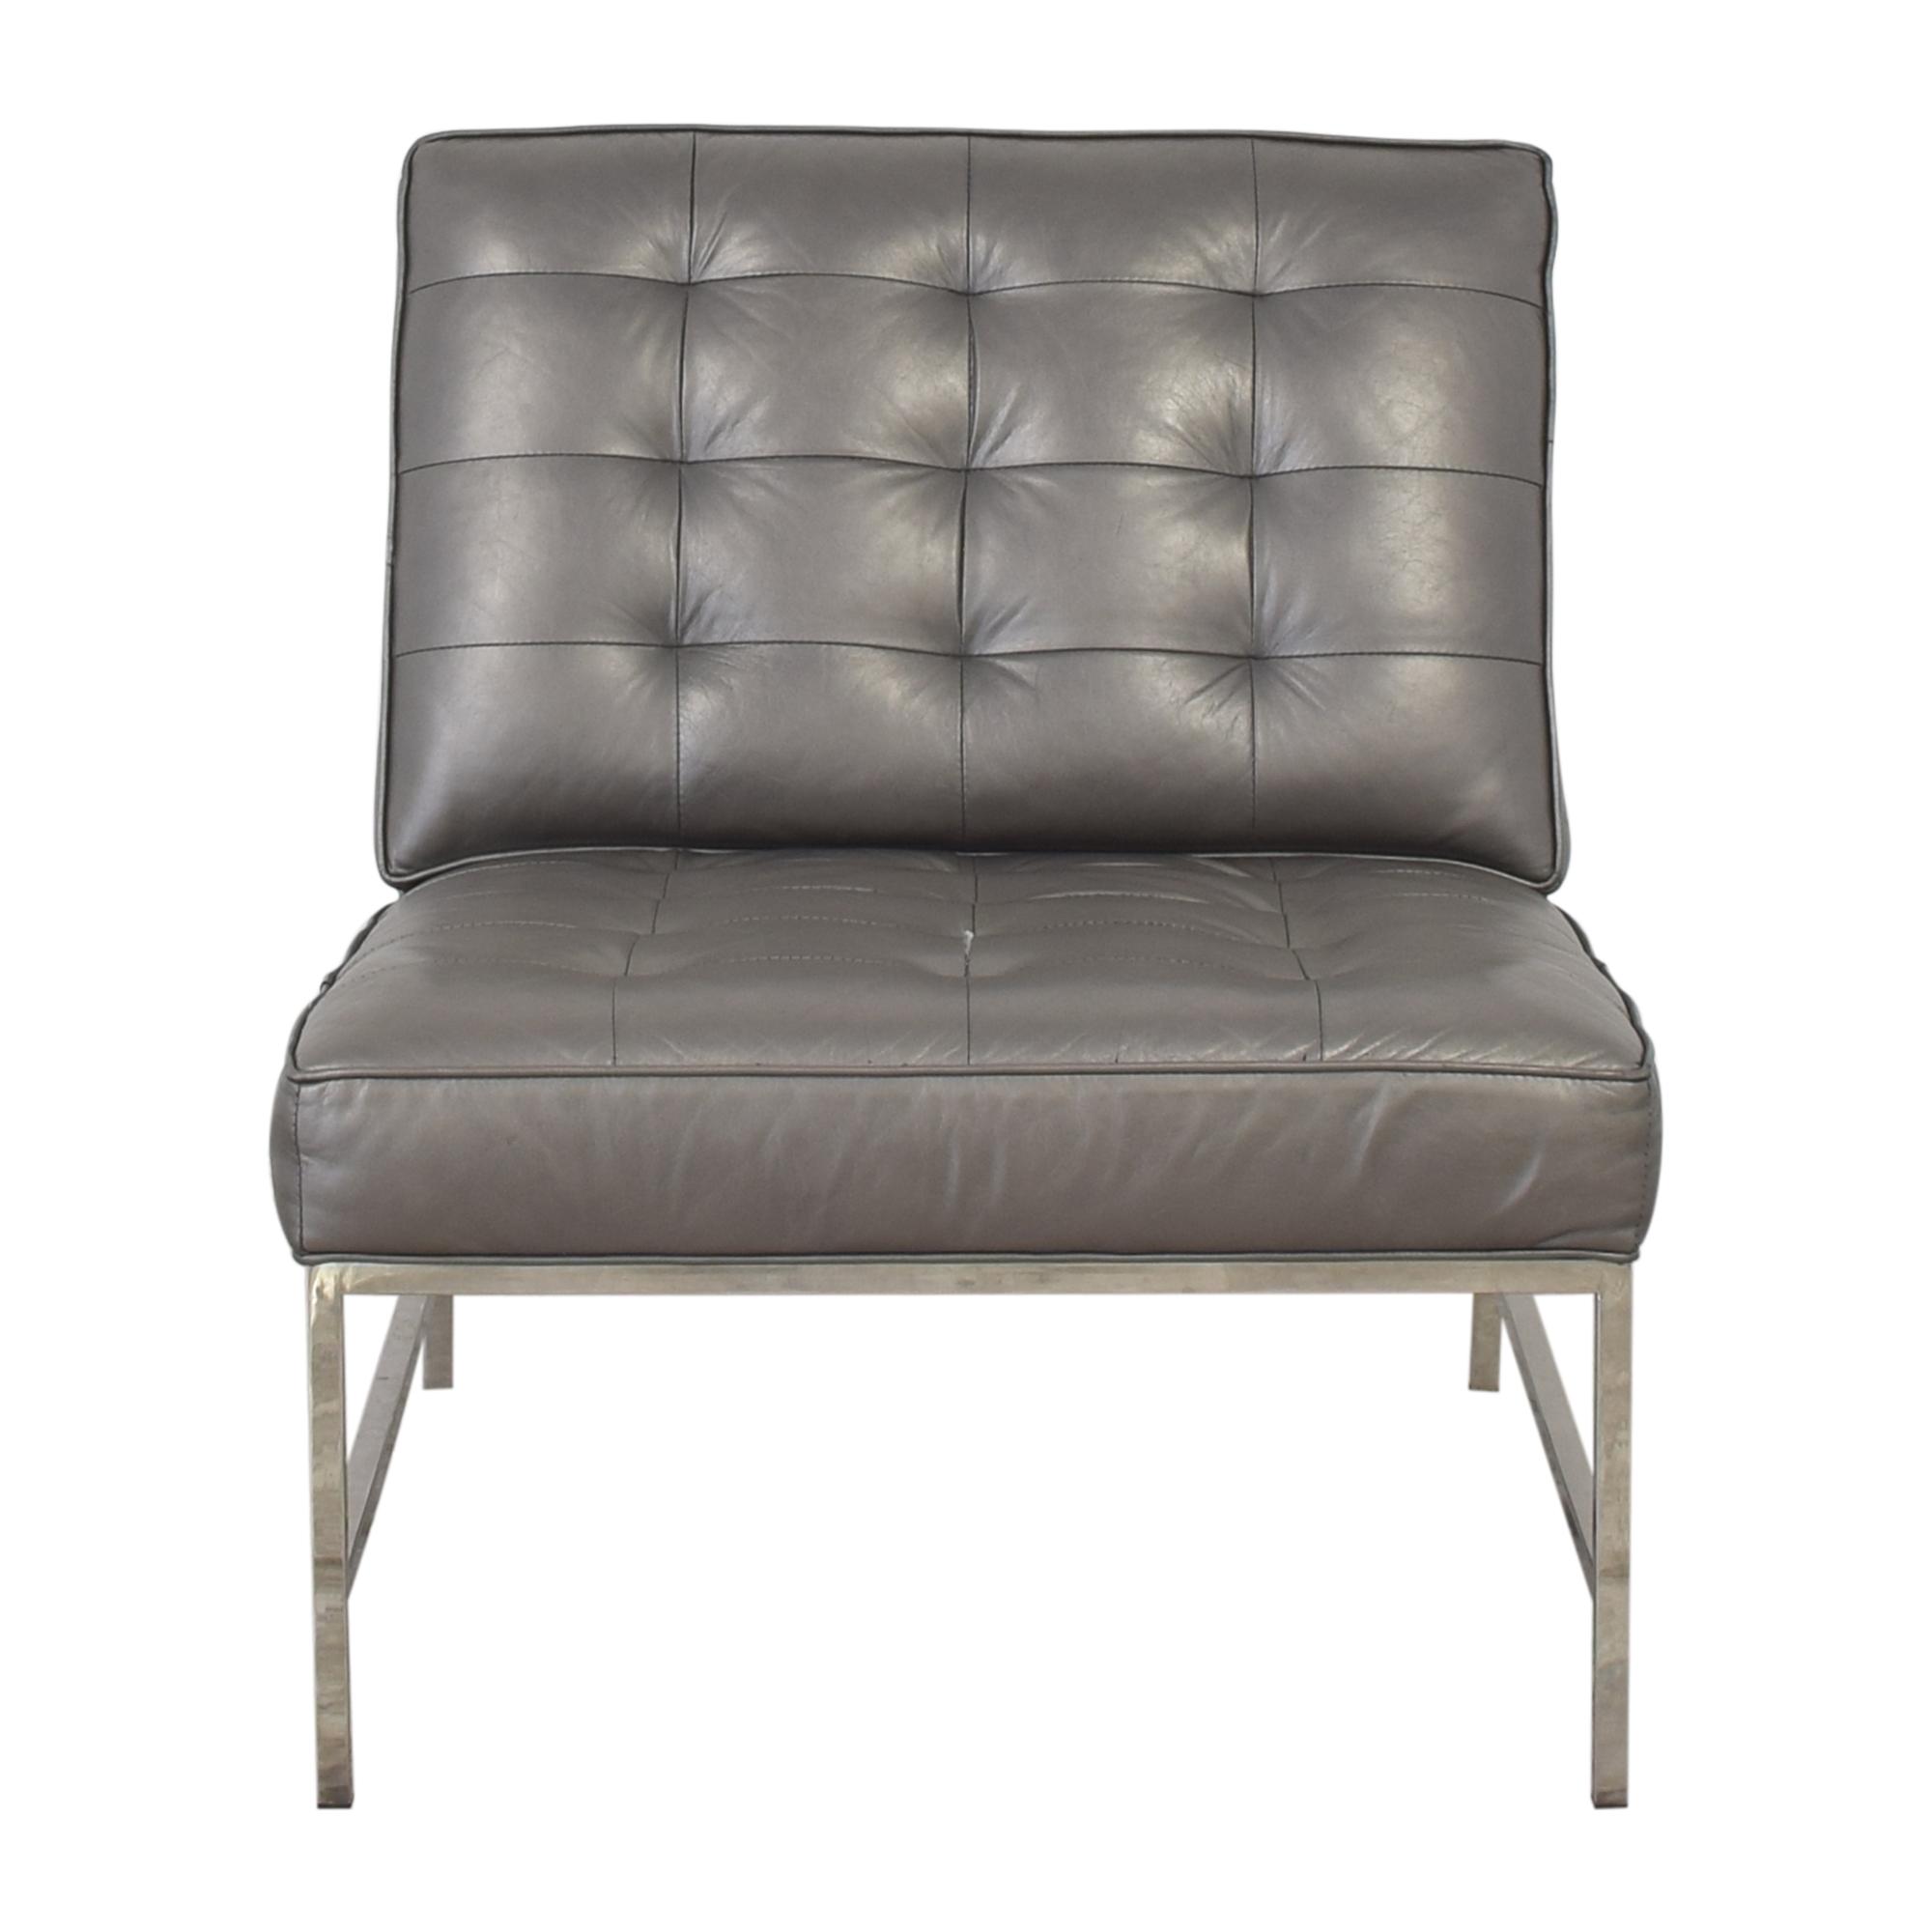 Mitchell Gold + Bob Williams Mitchell Gold + Bob Williams Major Lounge Chair price